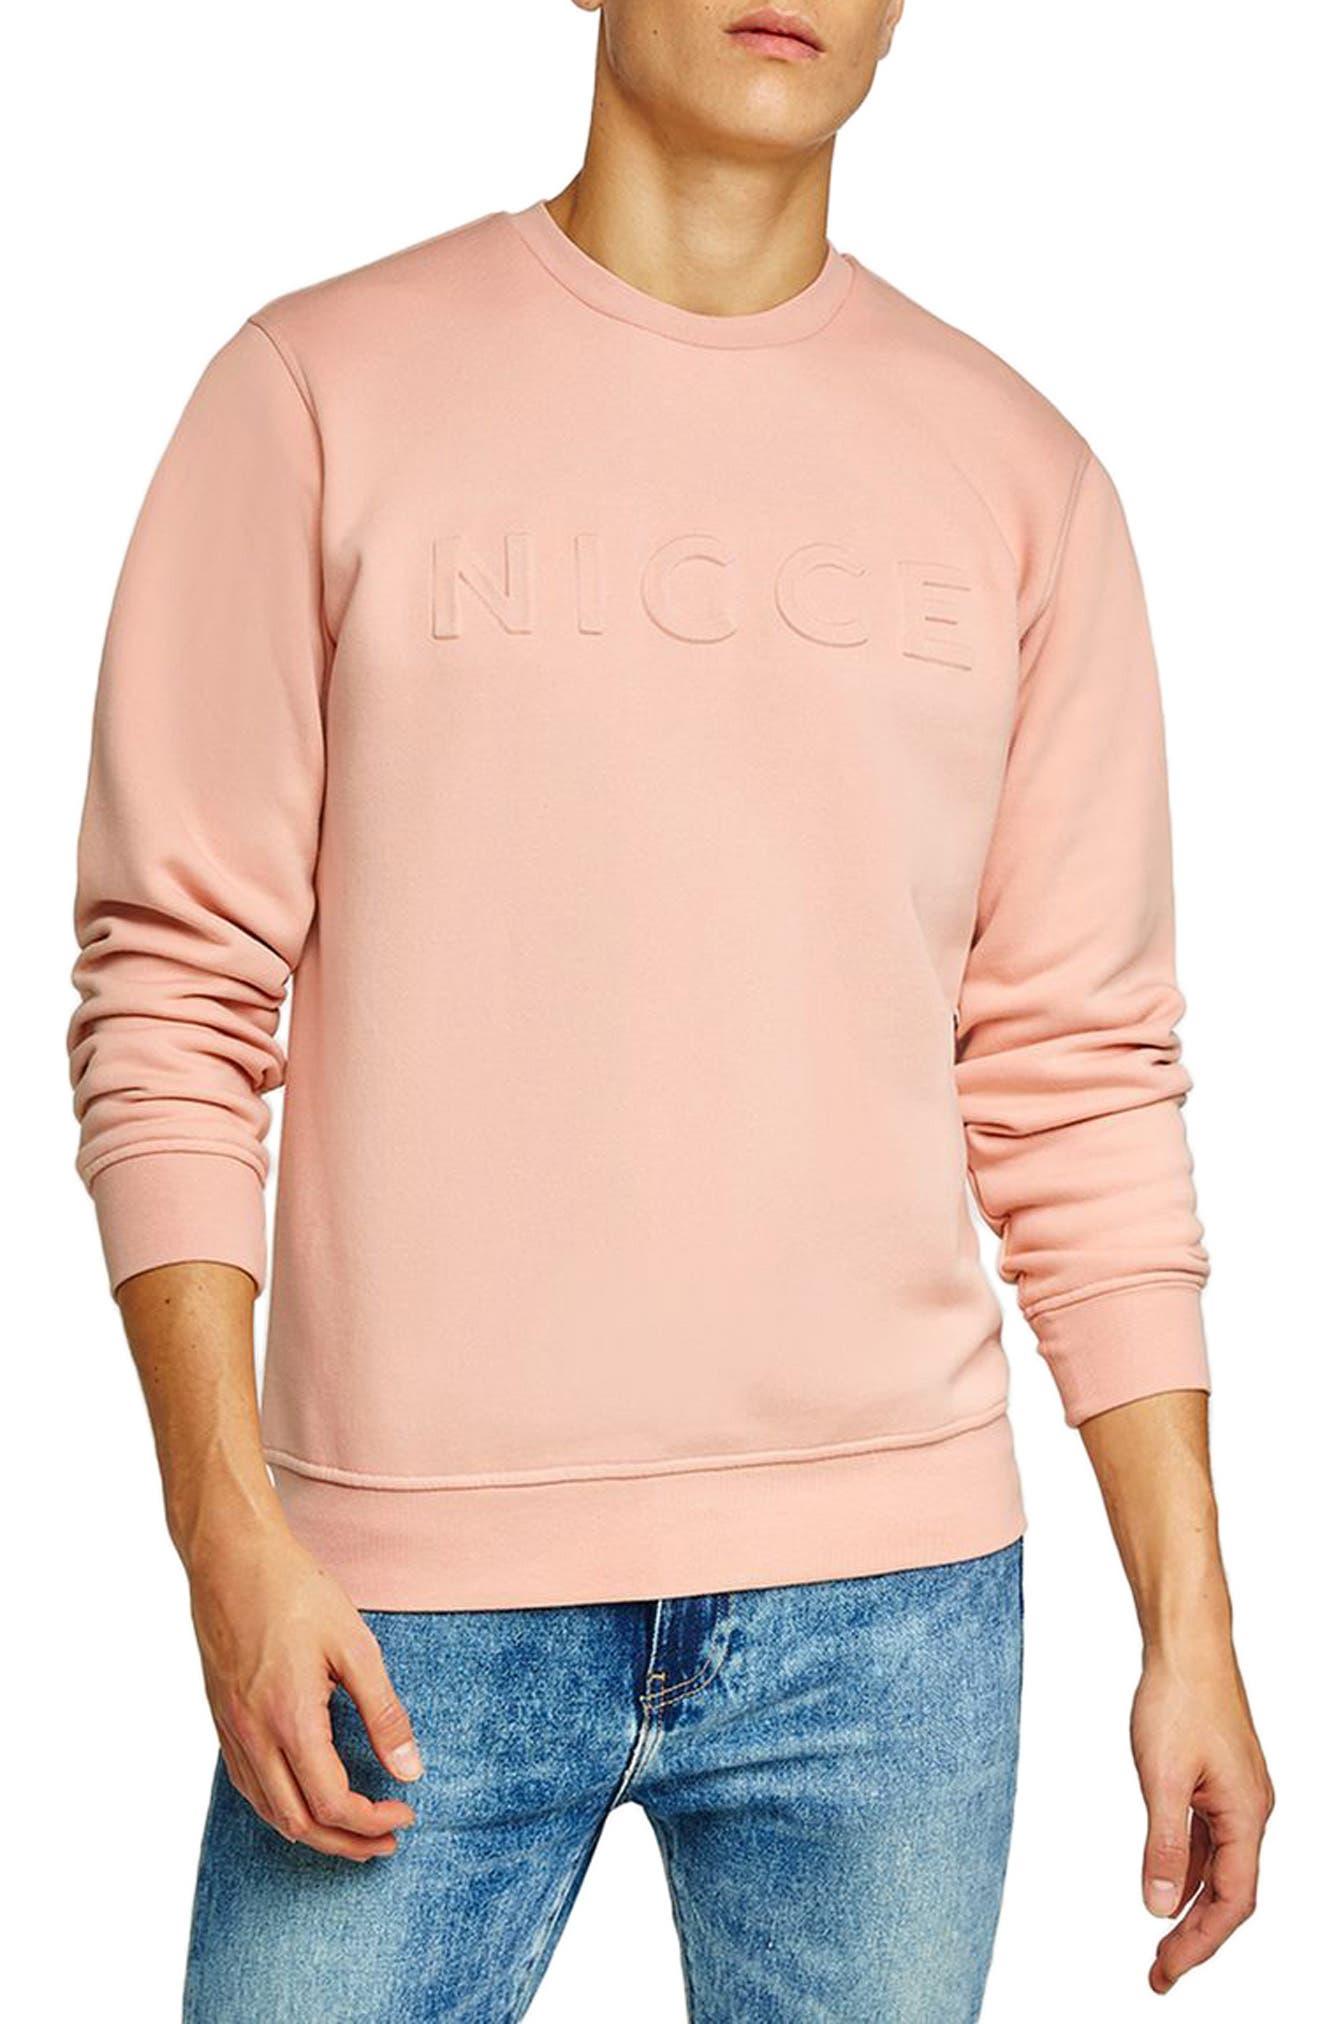 NICCE Slim Fit Embossed Sweatshirt,                             Main thumbnail 1, color,                             Pink